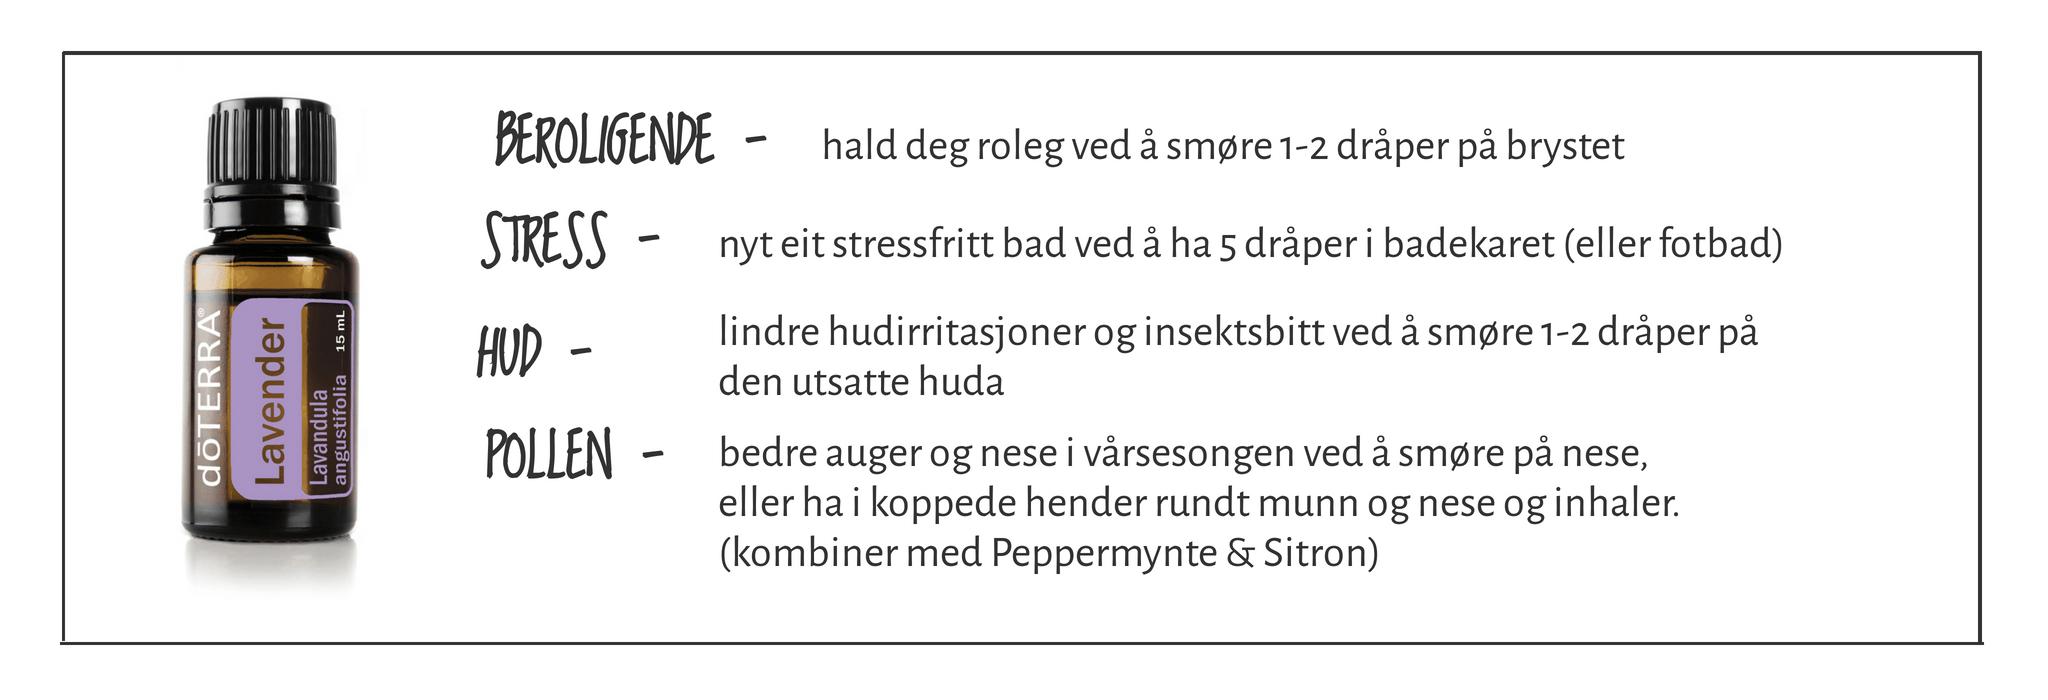 Lavendel - lp.faktaboks